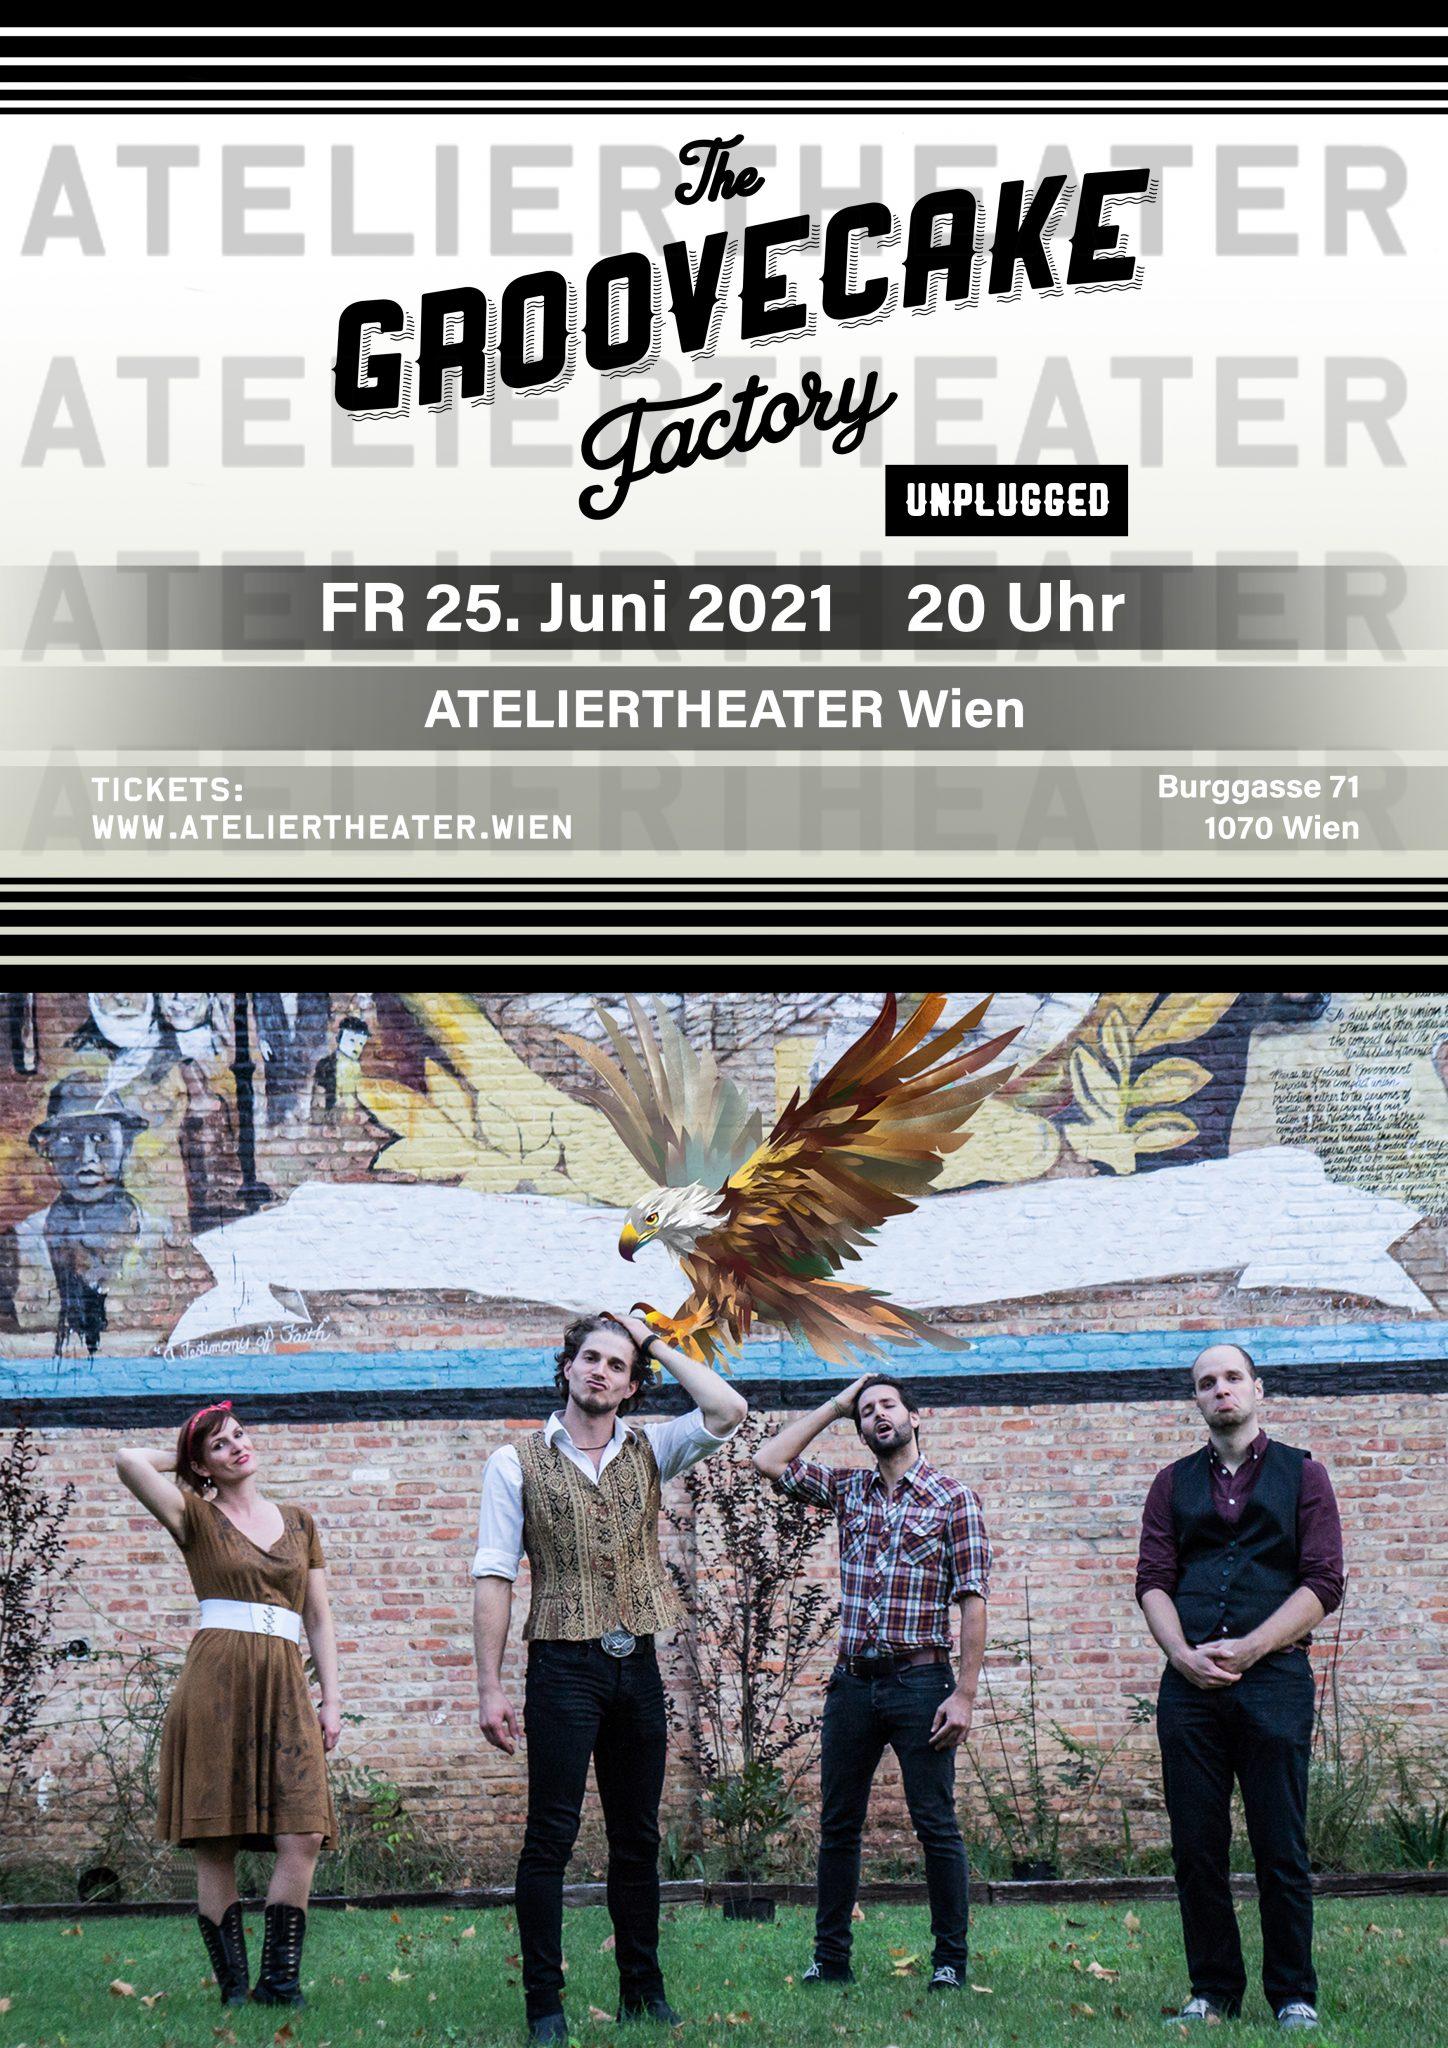 Plakat Ateliertheater The Groovecake Factory